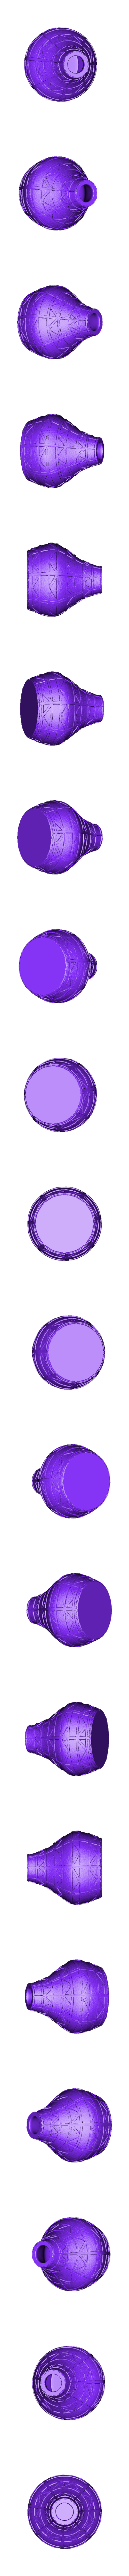 Vase grange   .stl Télécharger fichier STL X86 Mini vase collection  • Objet imprimable en 3D, motek